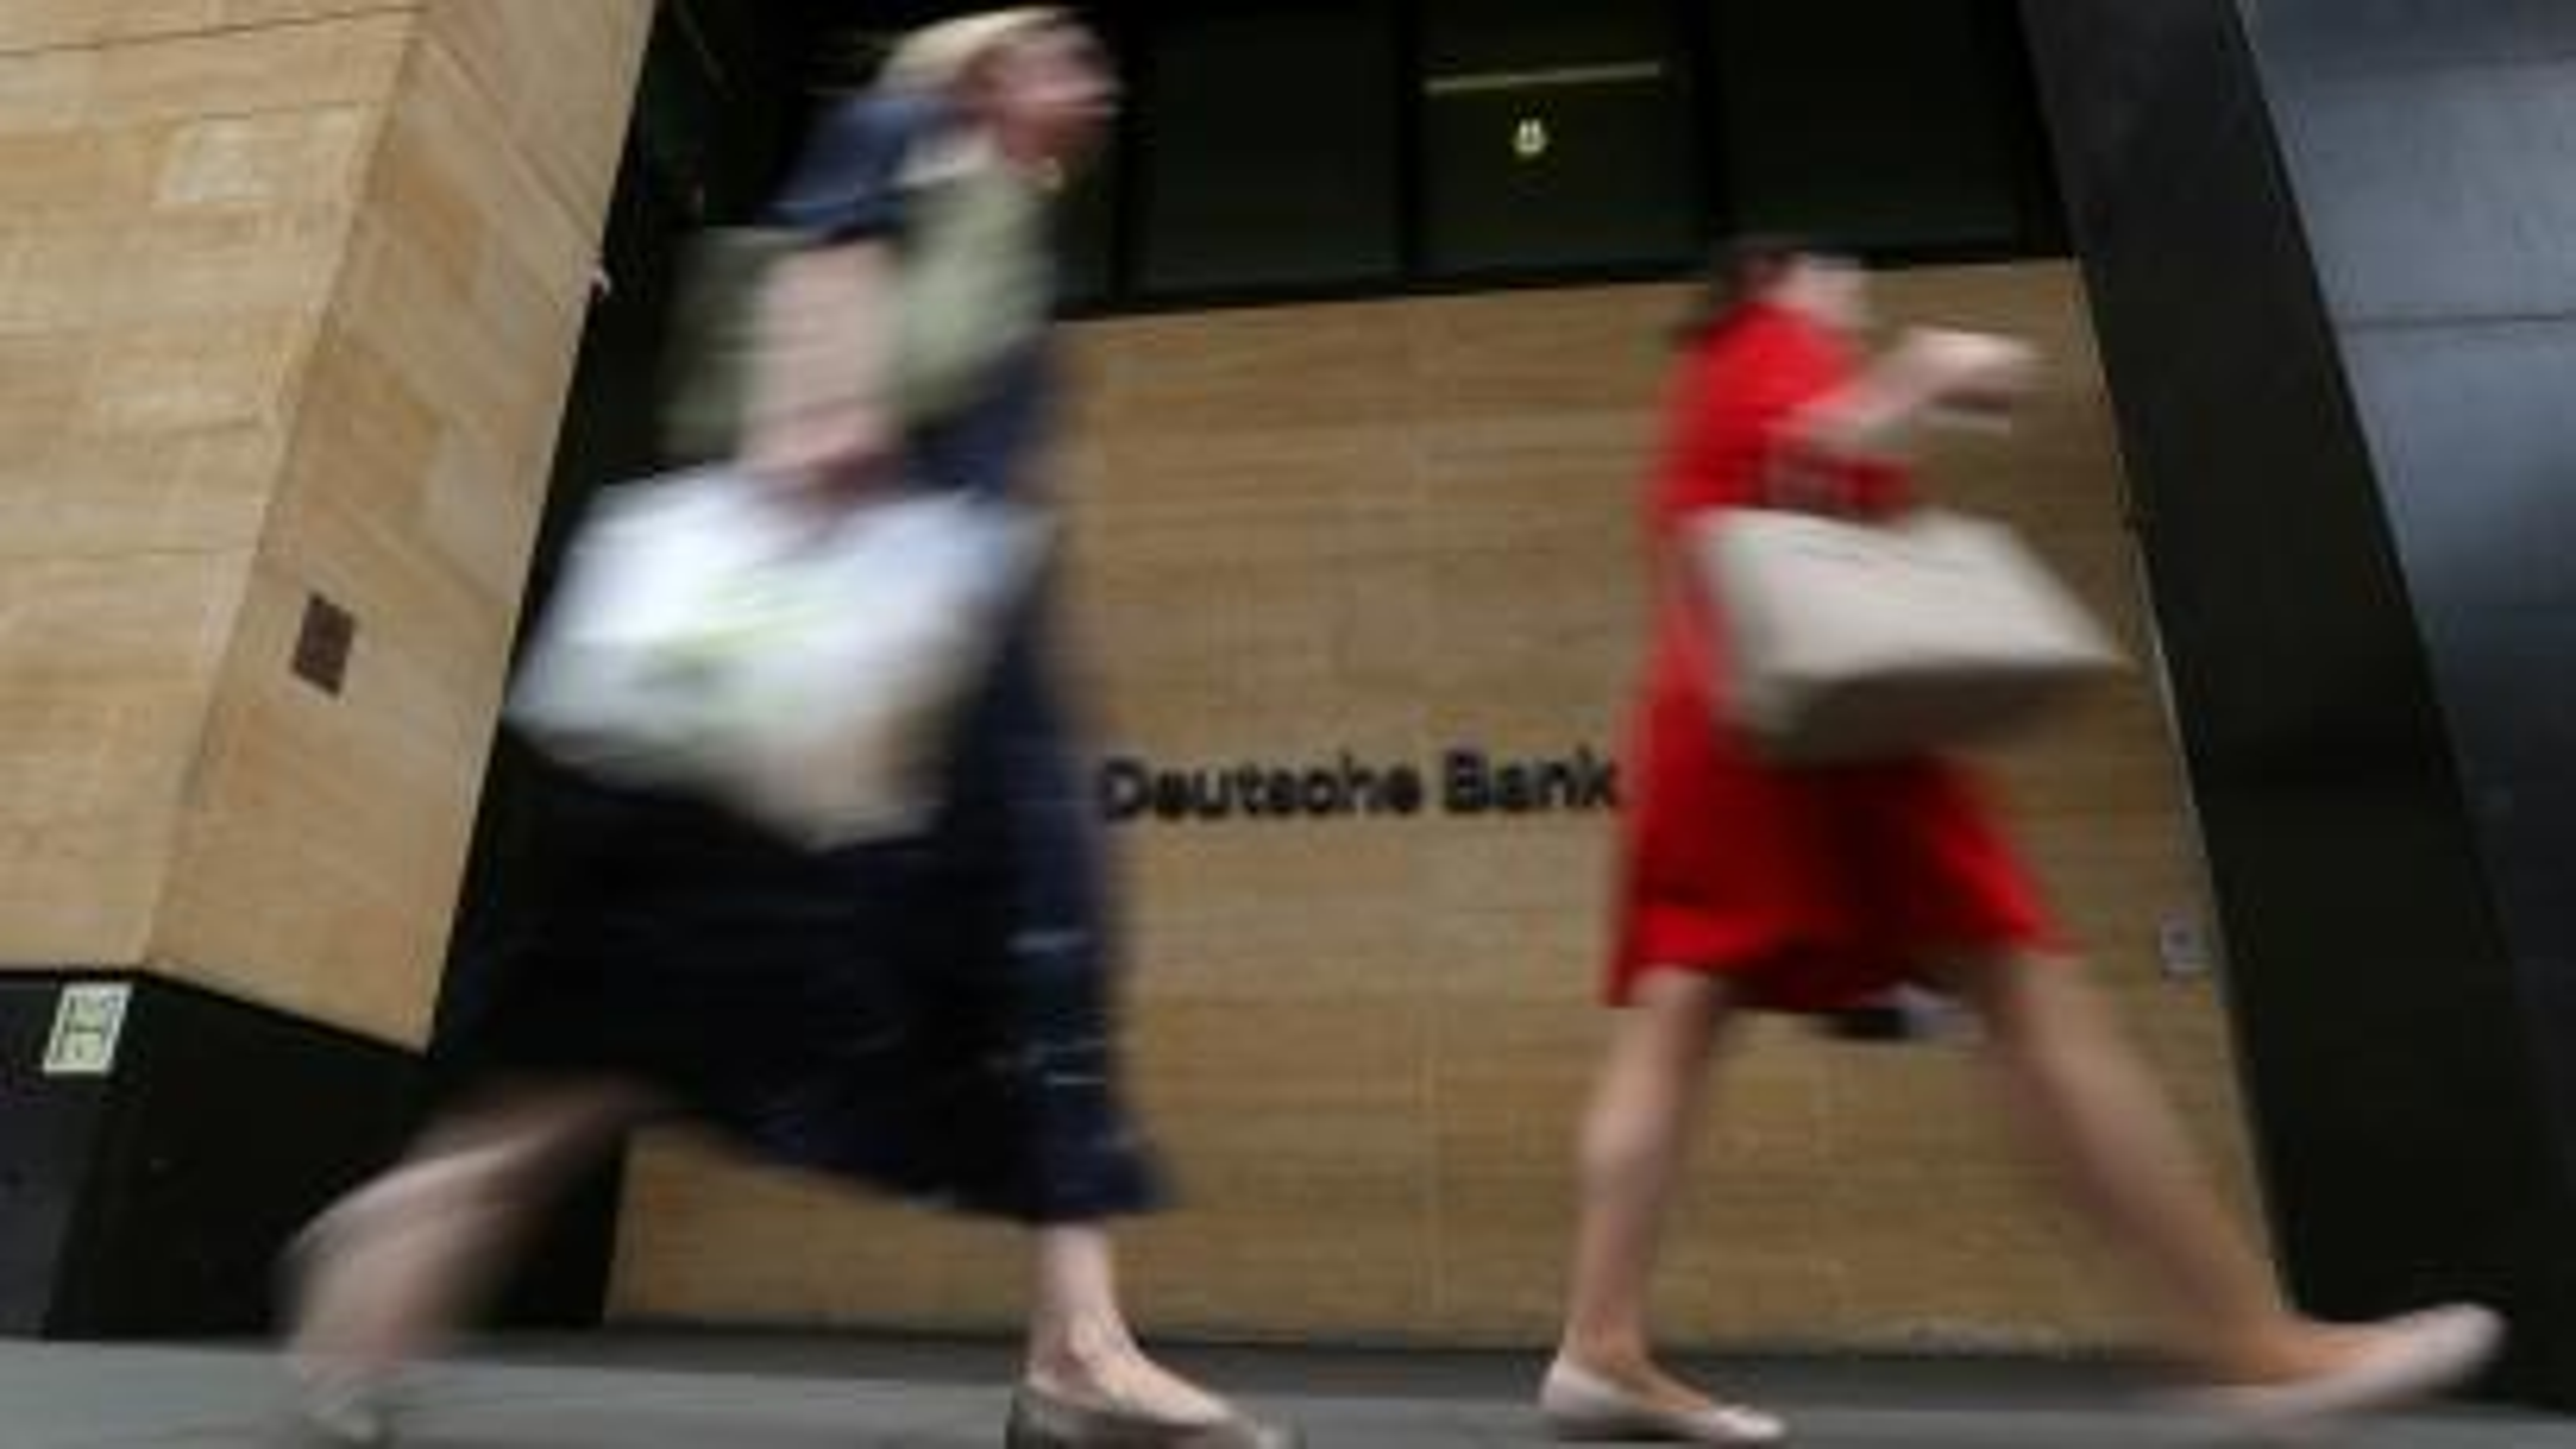 Deutsche Bank shares sink as investors assess huge restructuring